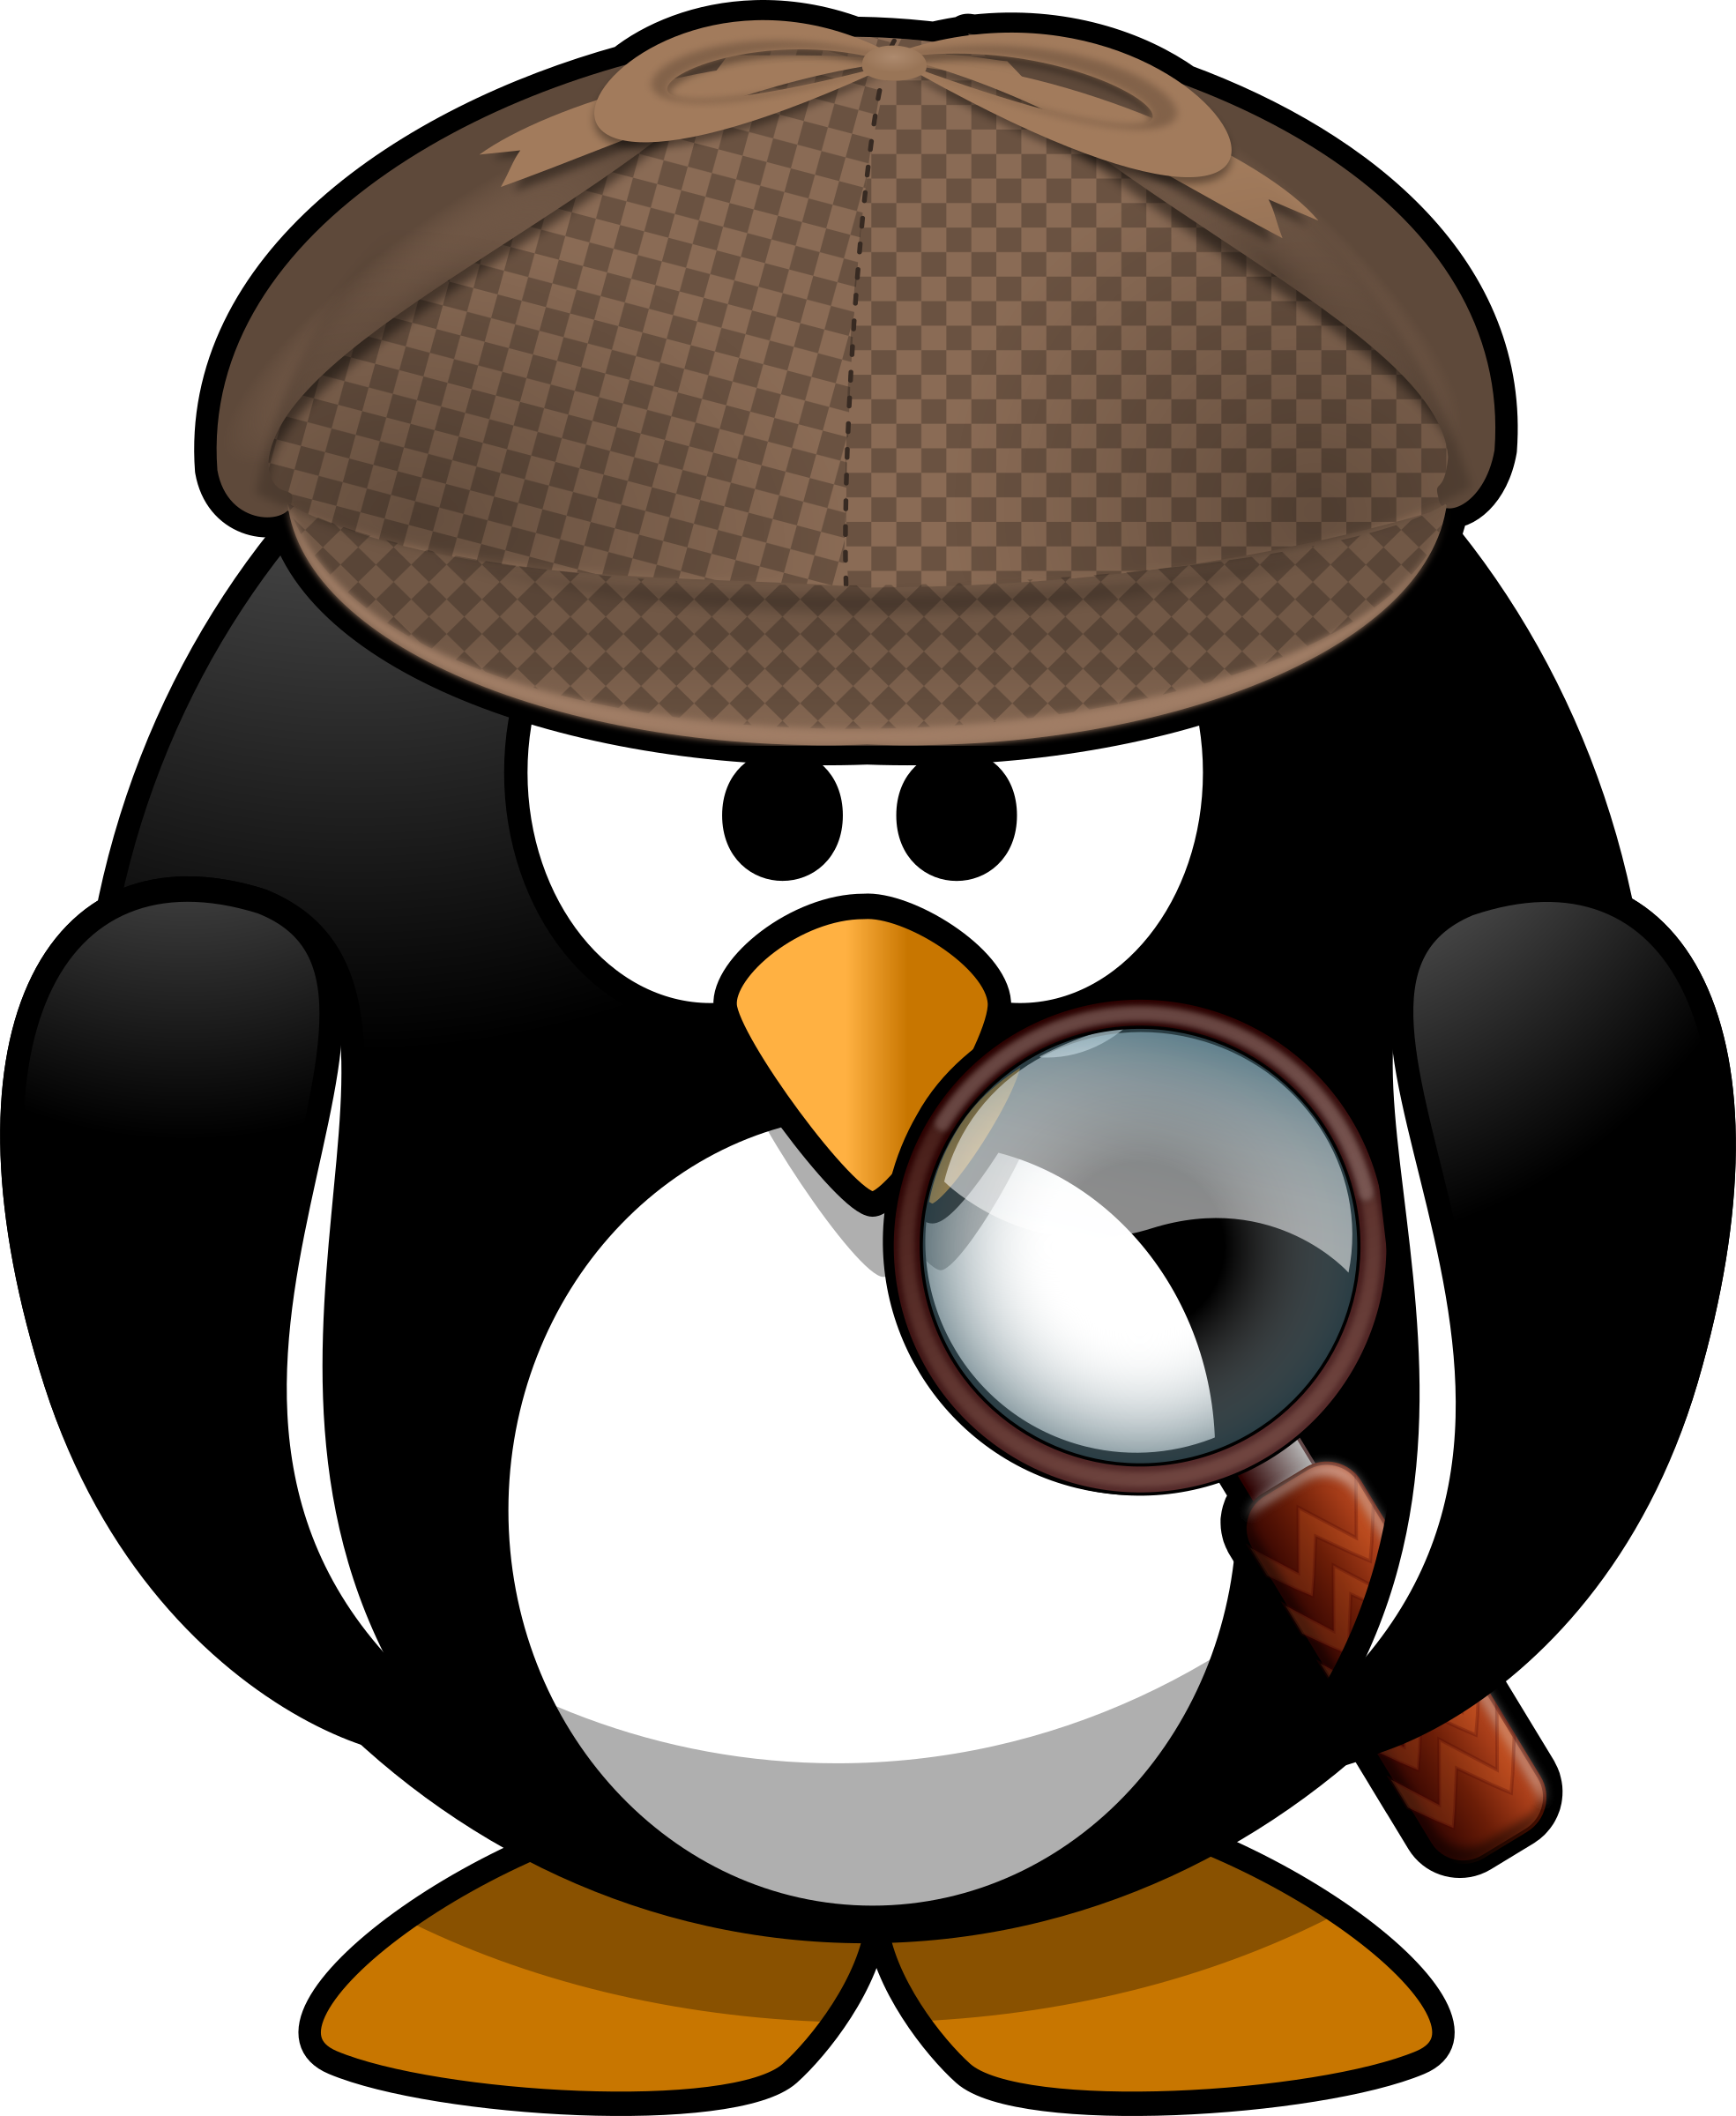 Animal clipart detective Clipart Animal Detective Detective Animal